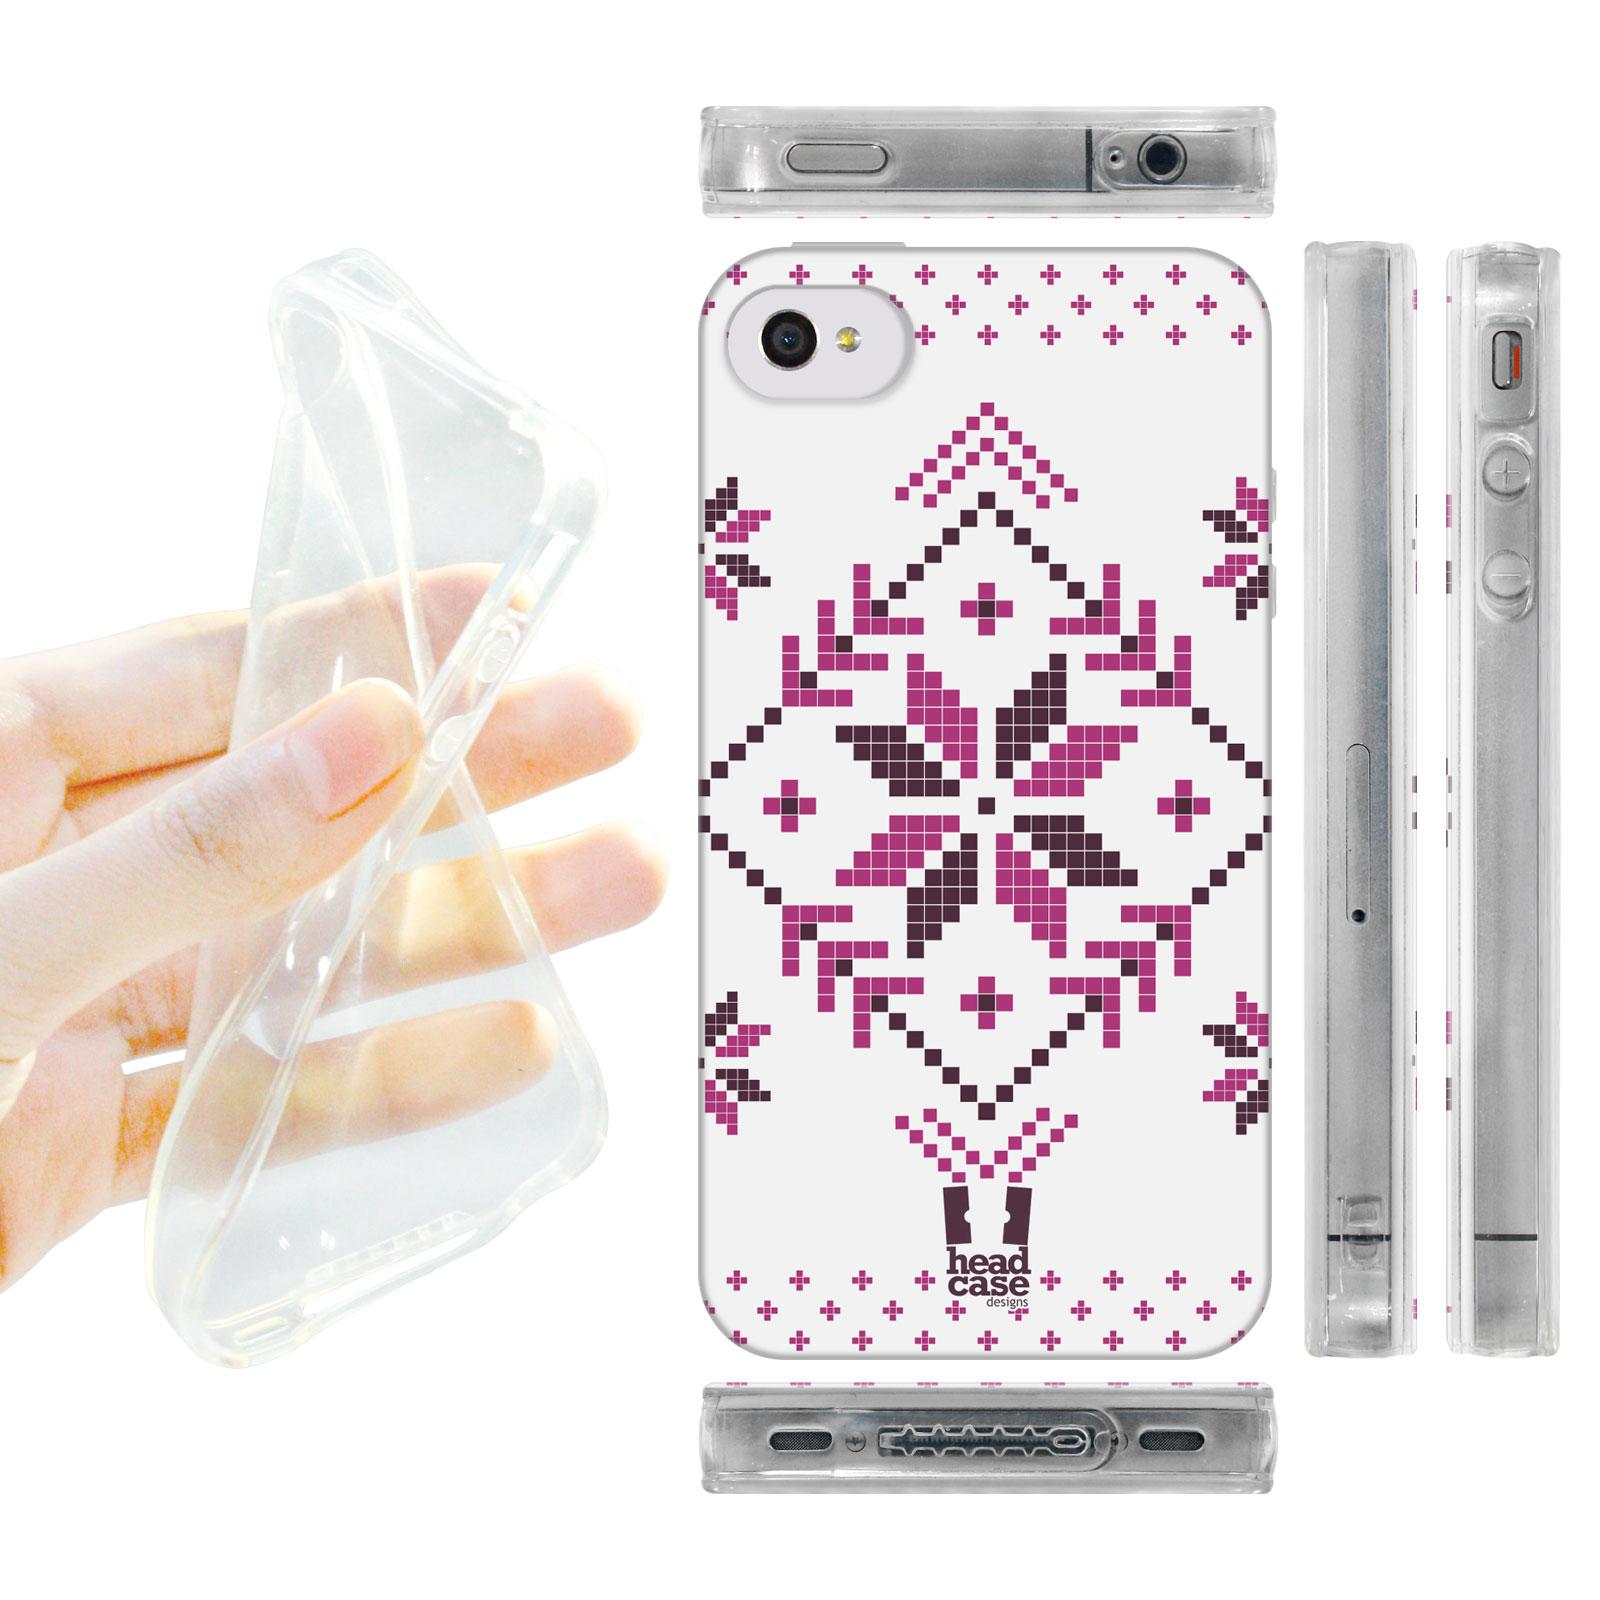 HEAD CASE silikonový obal na mobil Iphone 4/4S Vzor zima fialová vločka bílé pozadí